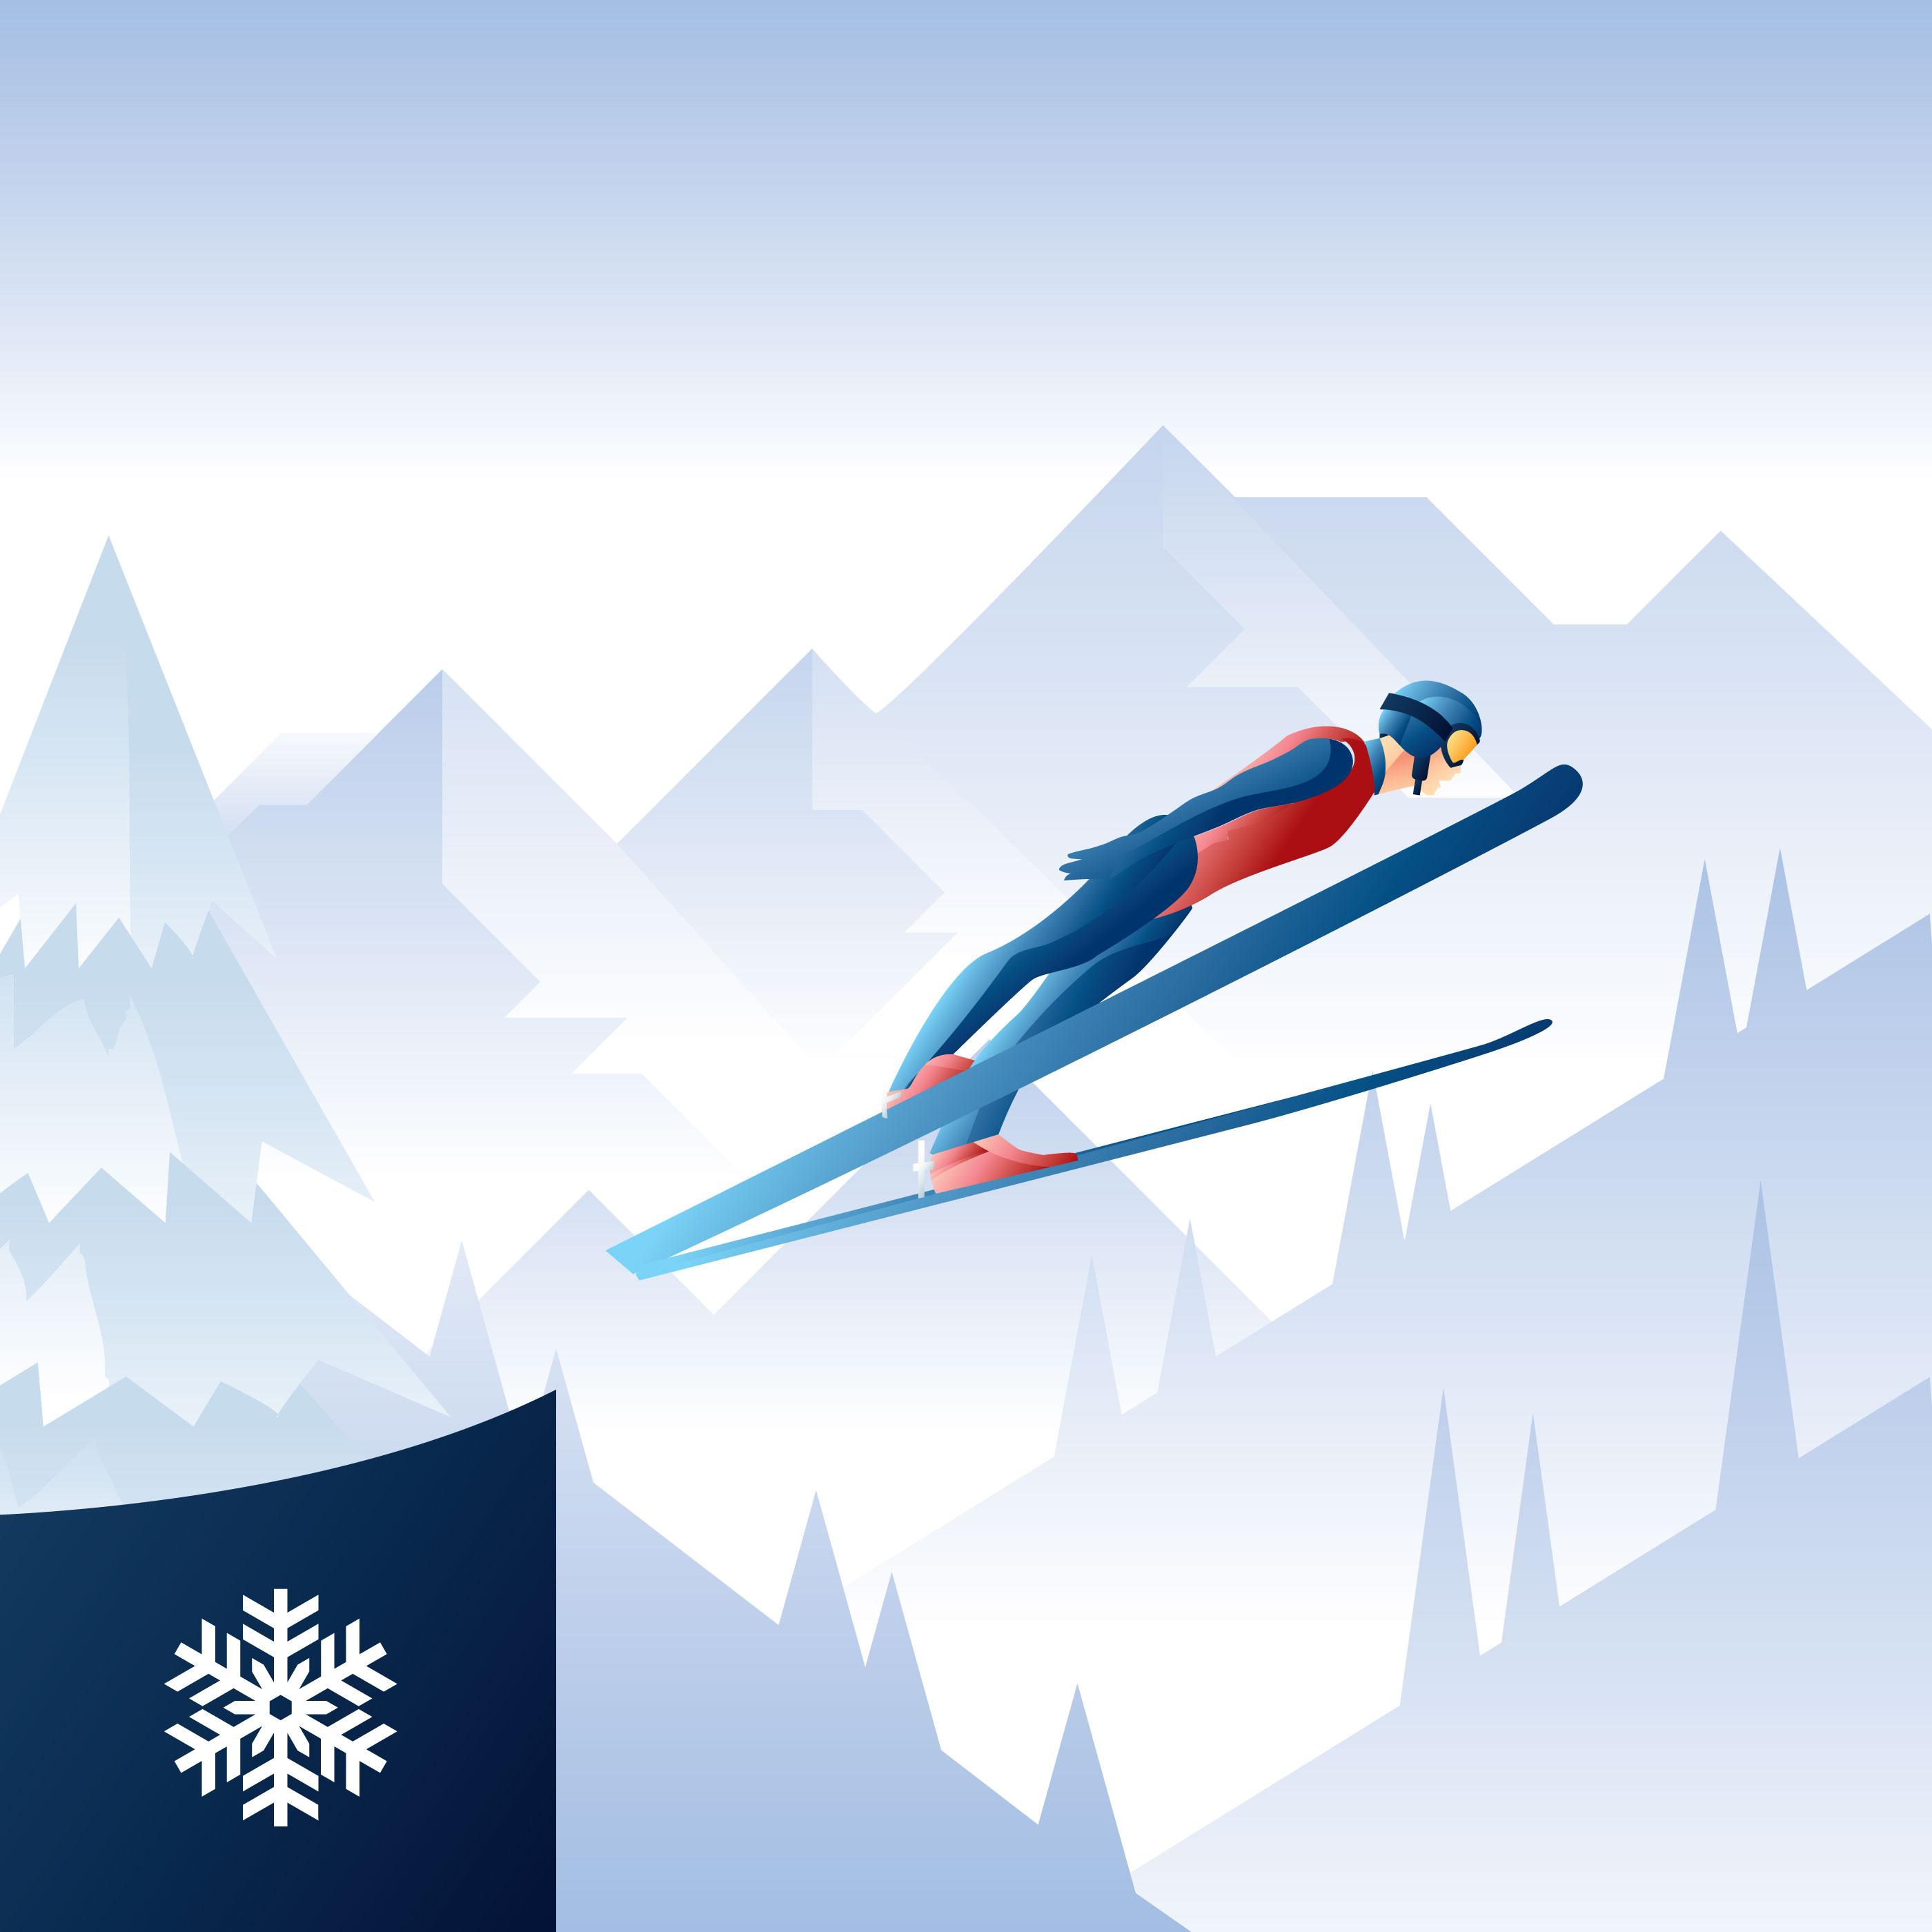 Ski jumping clipart